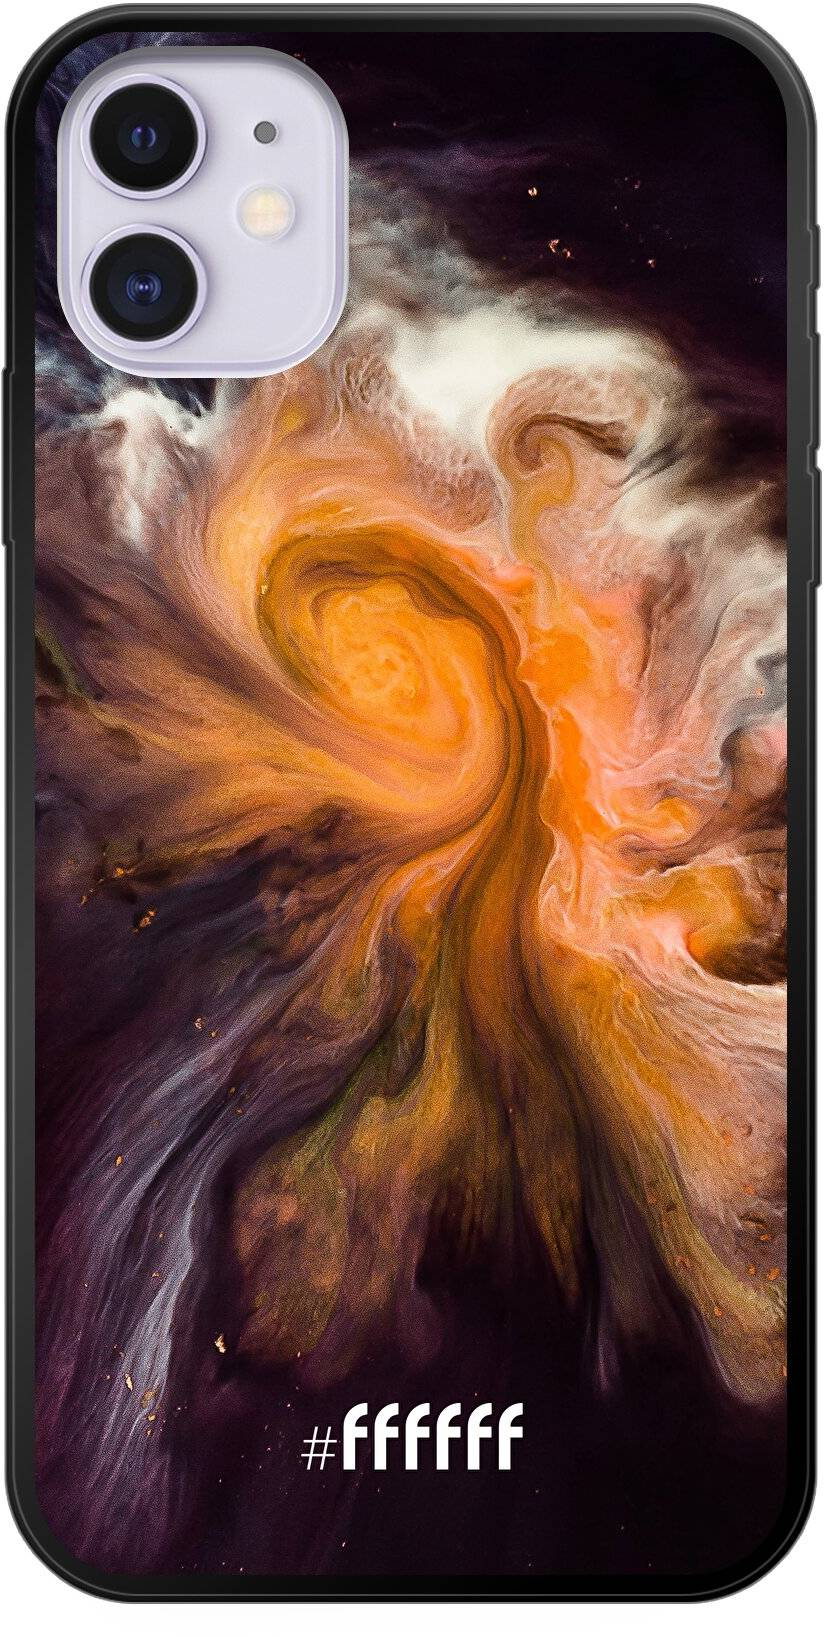 Crazy Space iPhone 11